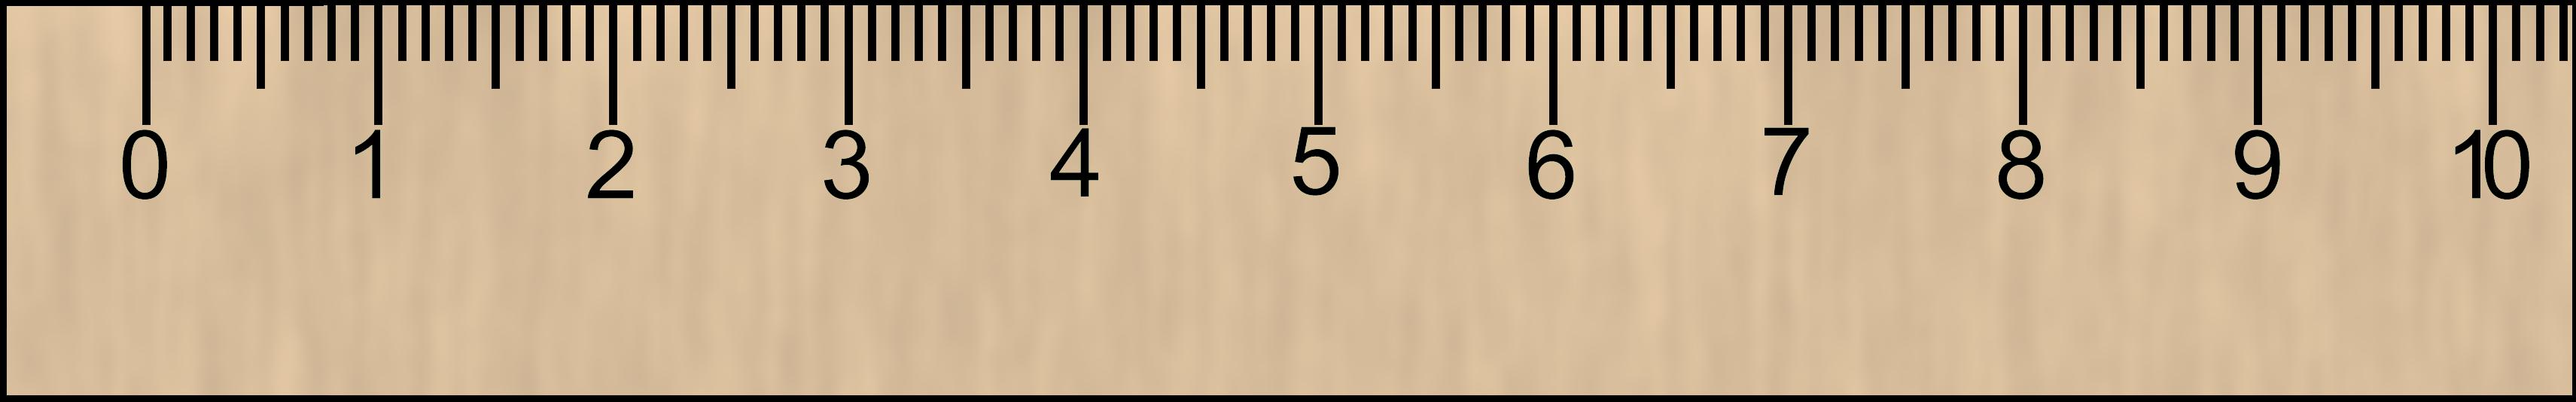 Centimeter Ruler Clipart | www.pixshark.com - Images